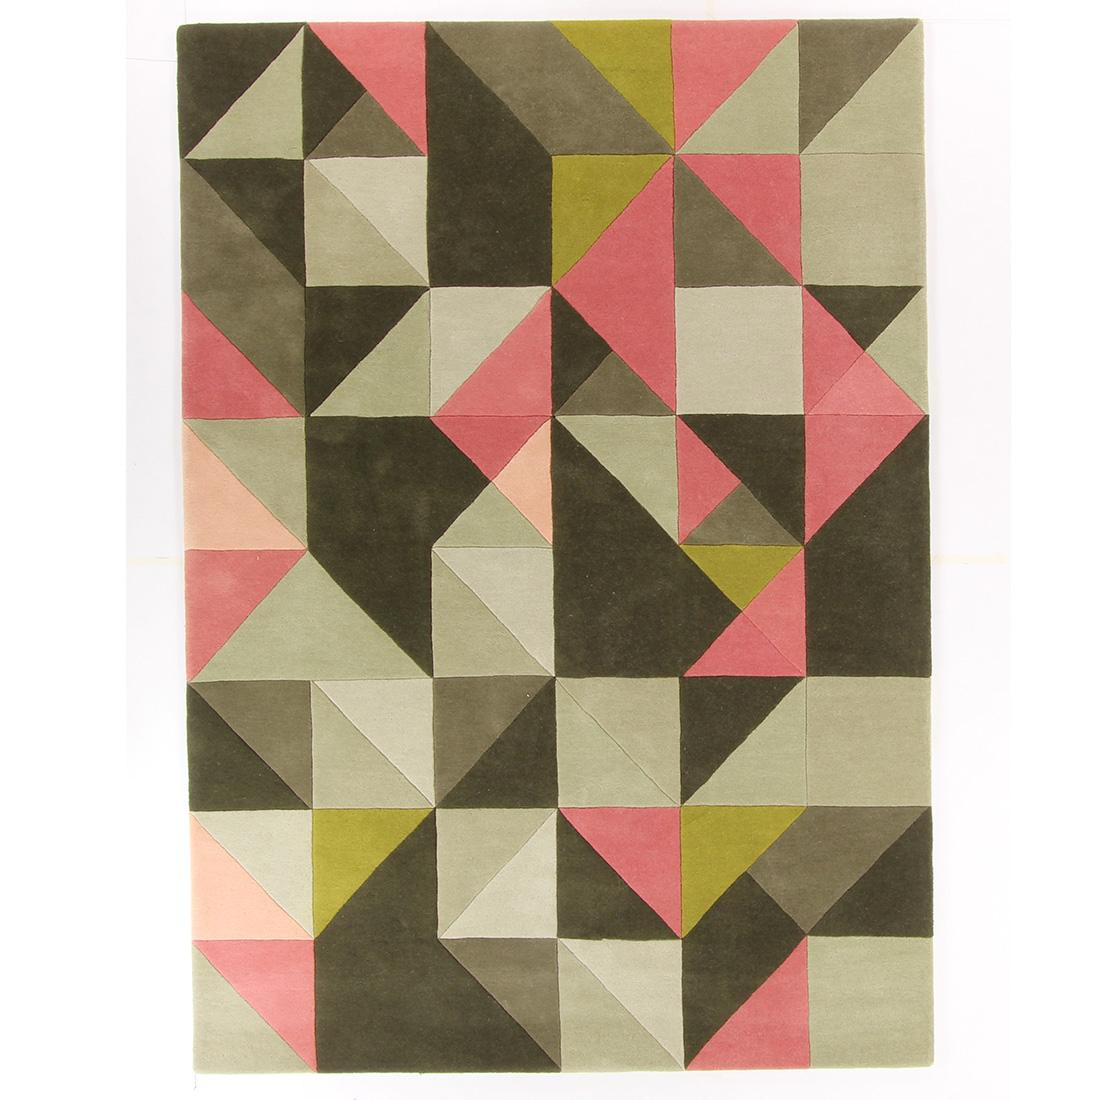 Vloerkleed Brinker Gaudion Misura | 170 x 230 cm